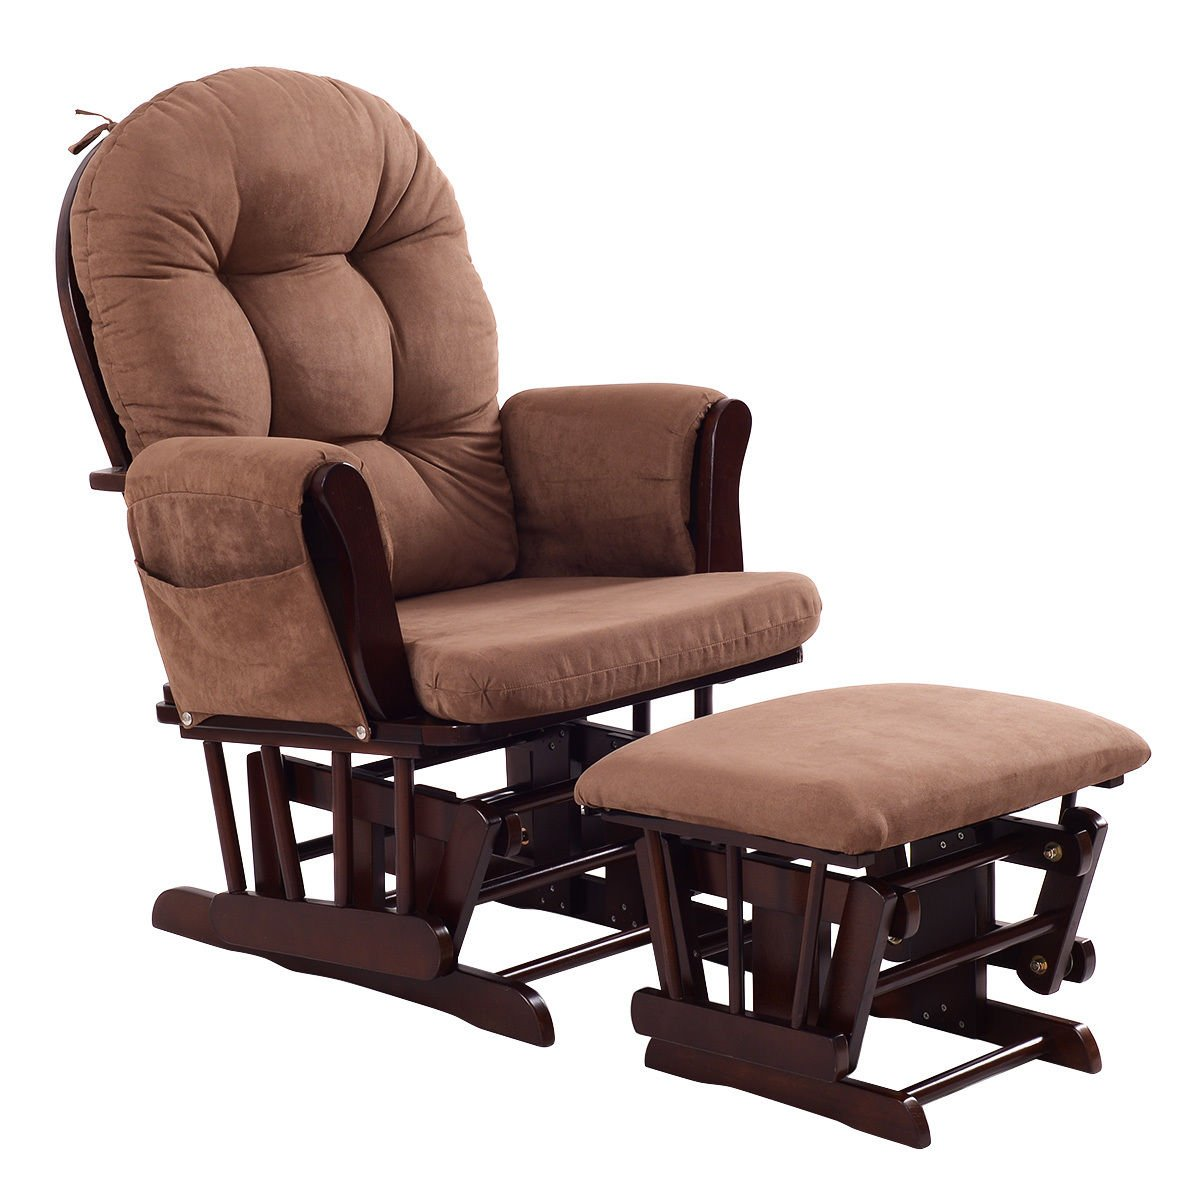 Costzon Baby Glider and Ottoman Cushion Set (Brown)